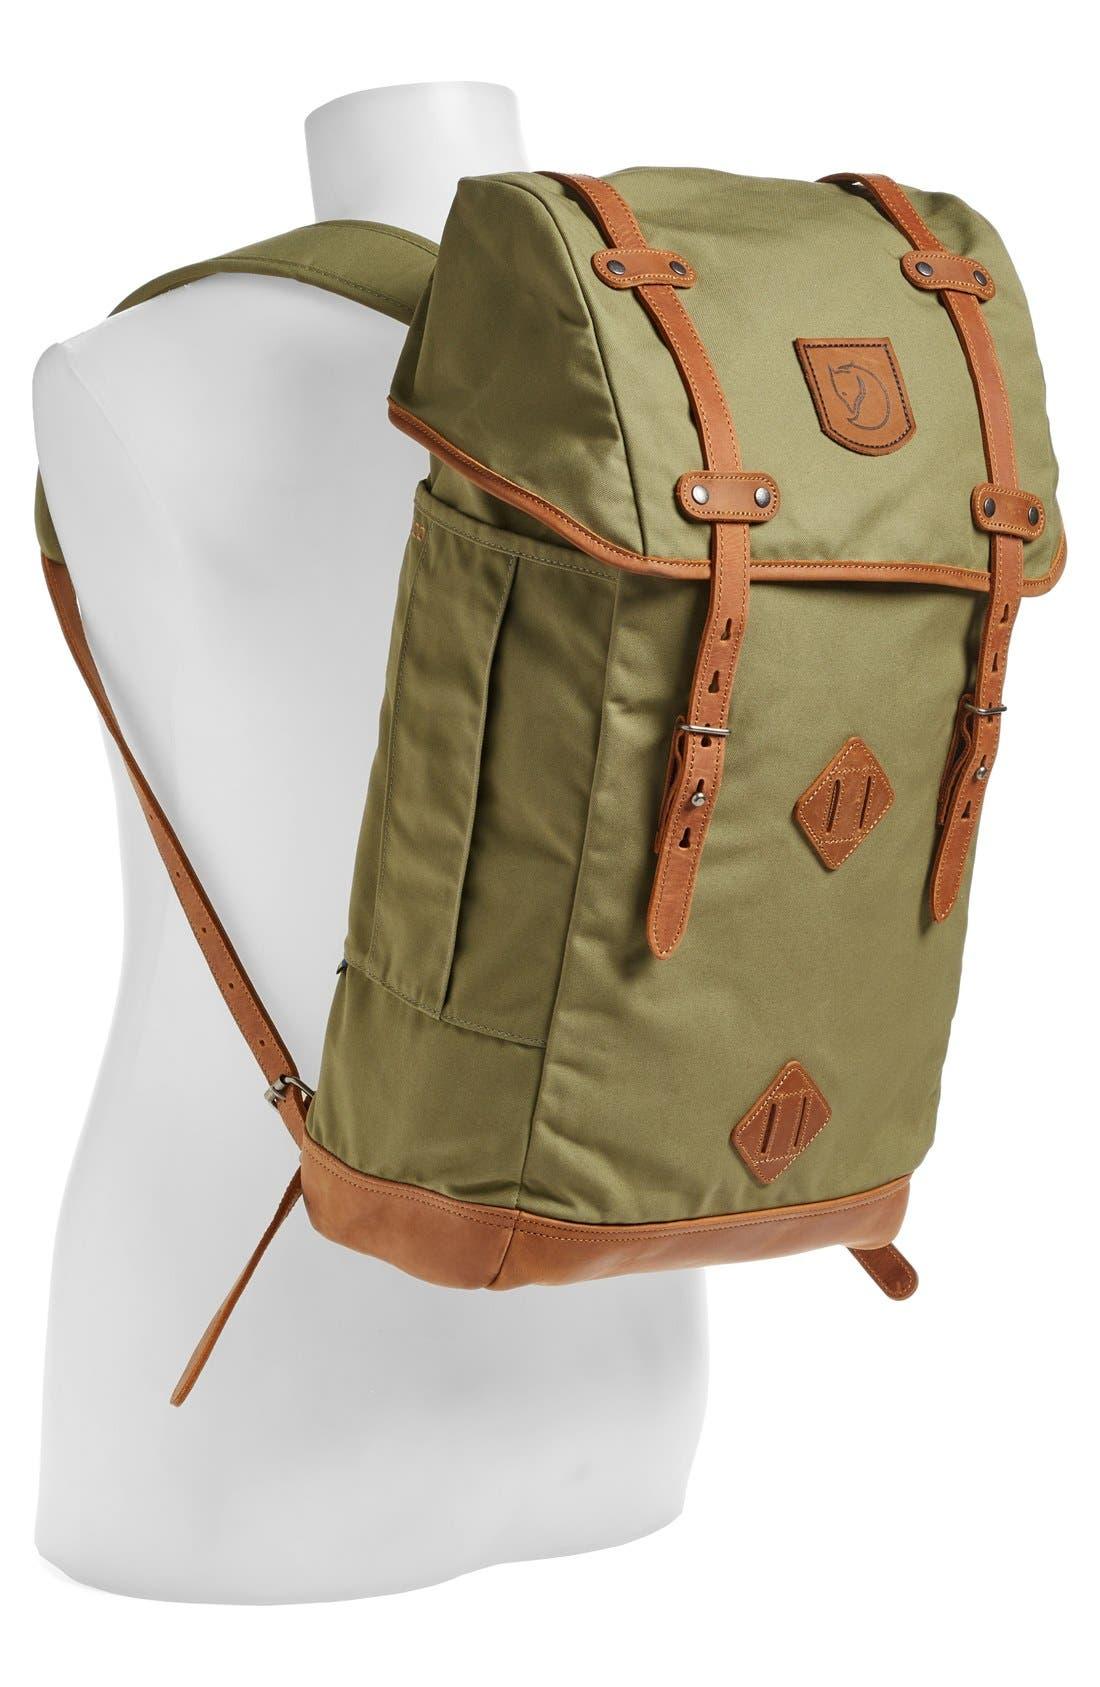 'Rucksack No. 21' Large Backpack,                             Alternate thumbnail 12, color,